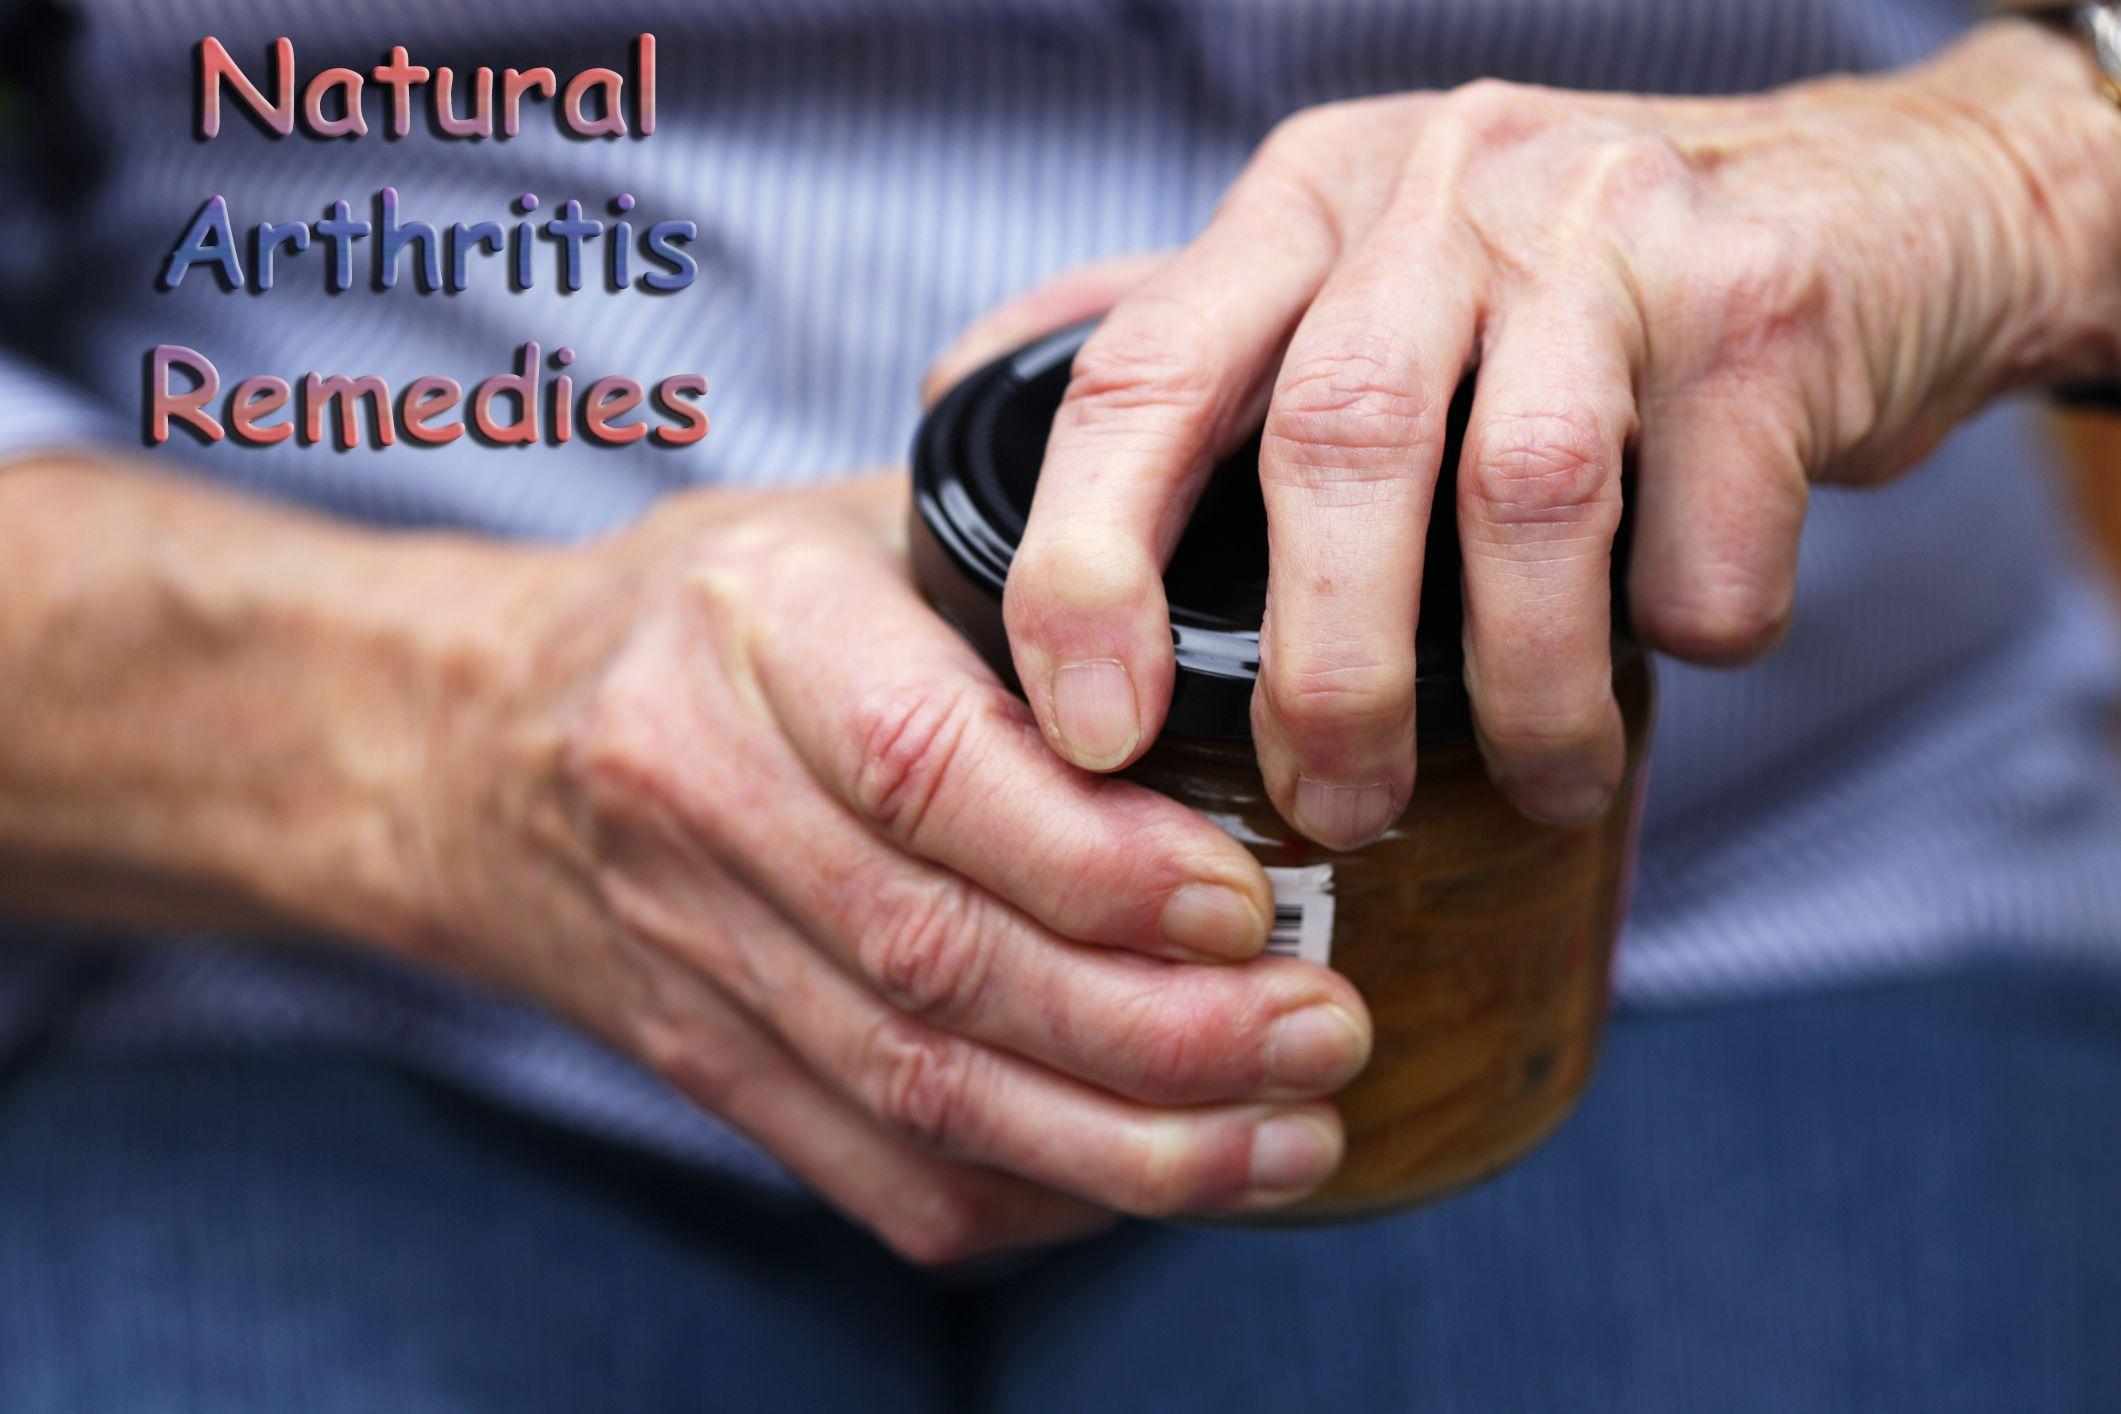 Arthritis Remedies Natural remedies for arthritis